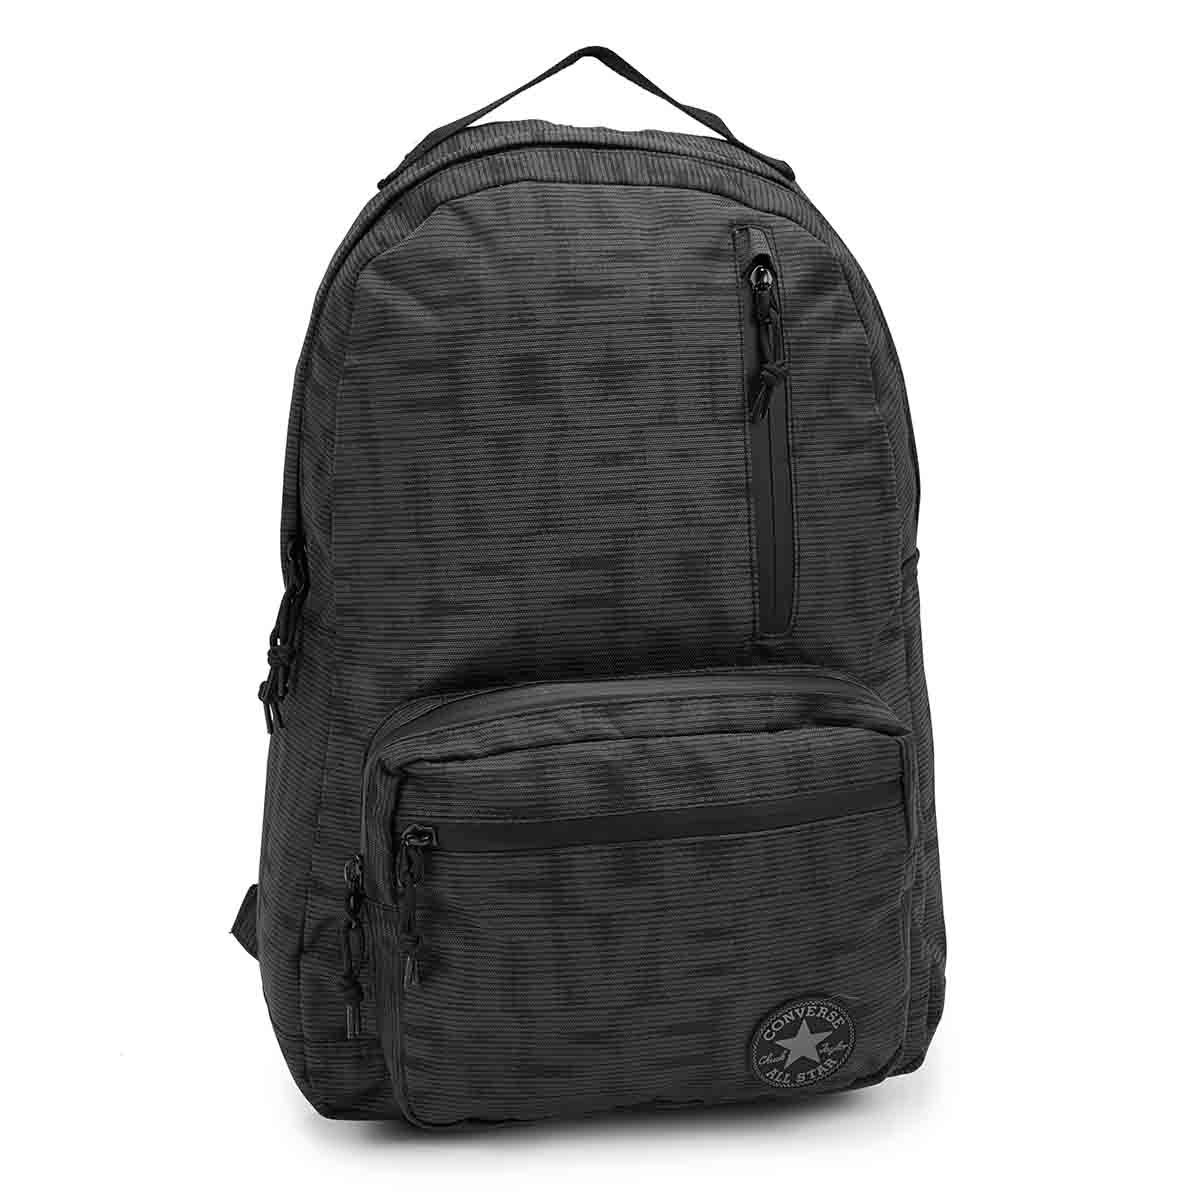 Unisex POLY GO woodmark backpack